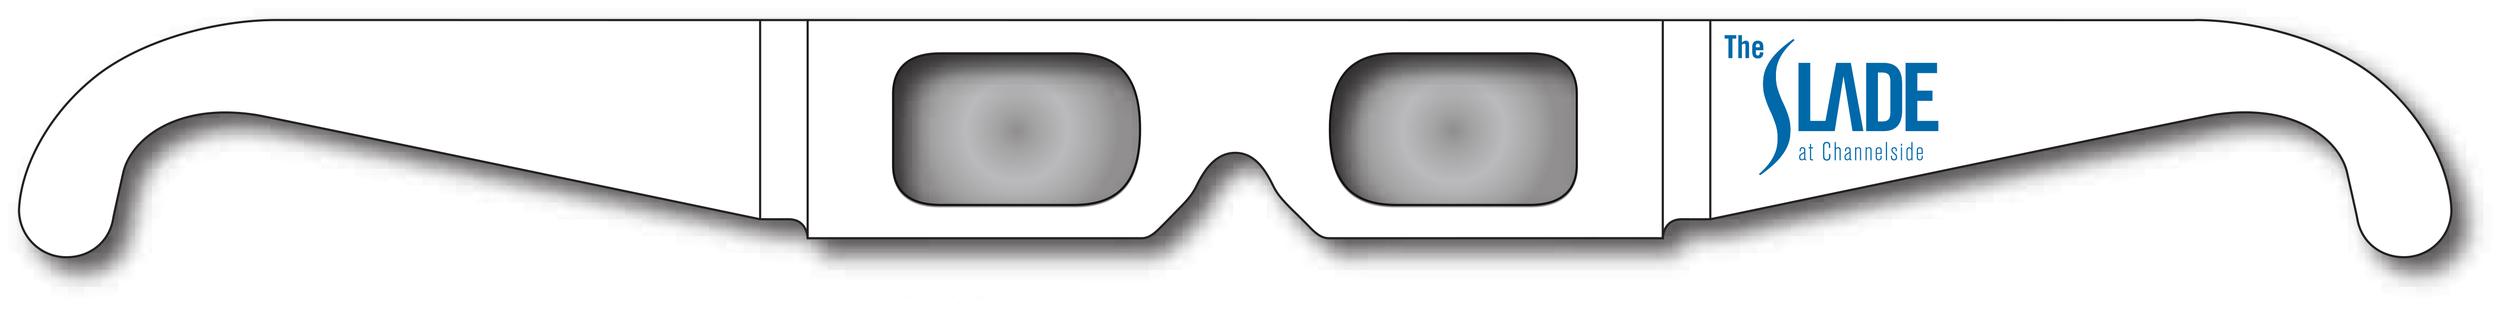 TheSlade3DGlasses.jpg